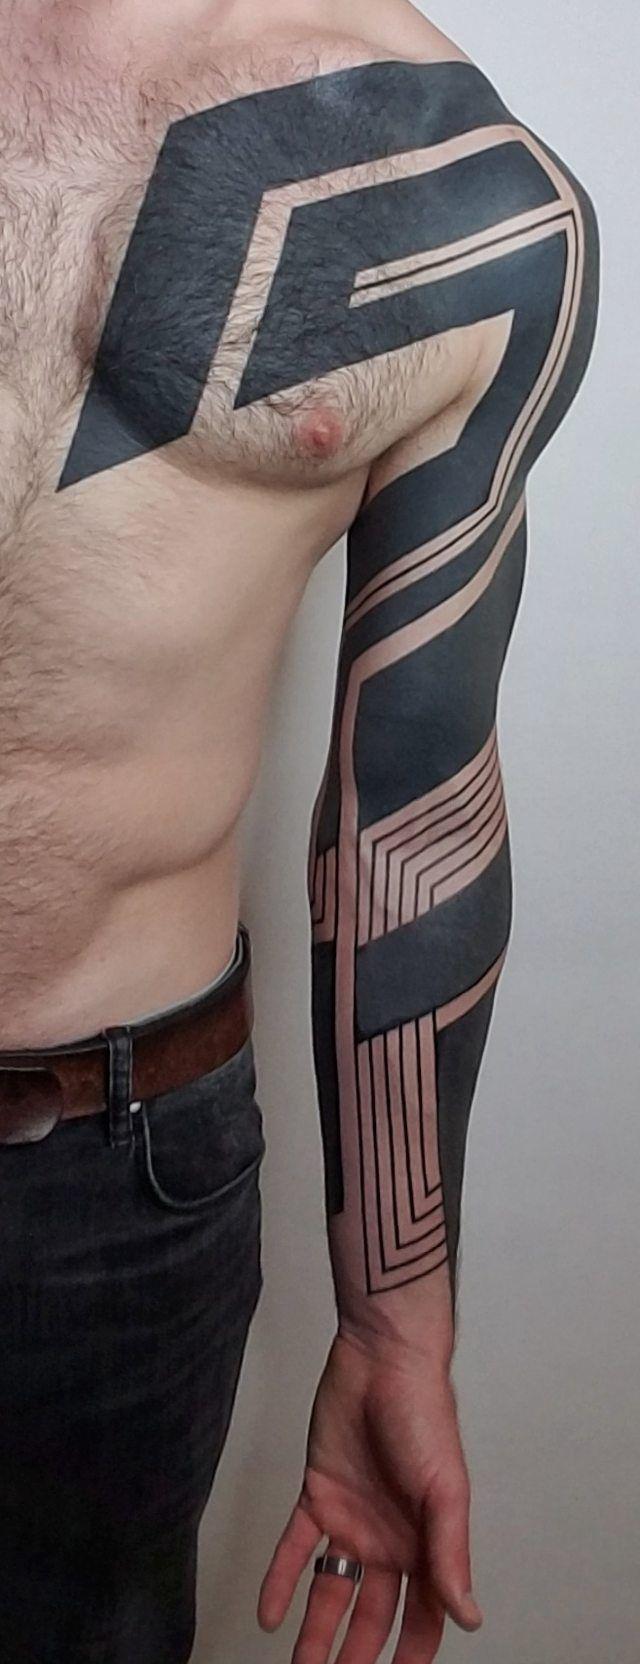 Freehand Geometric Blackwork by Ben Volt at Form8 Tattoo in San Francisco - Imgur